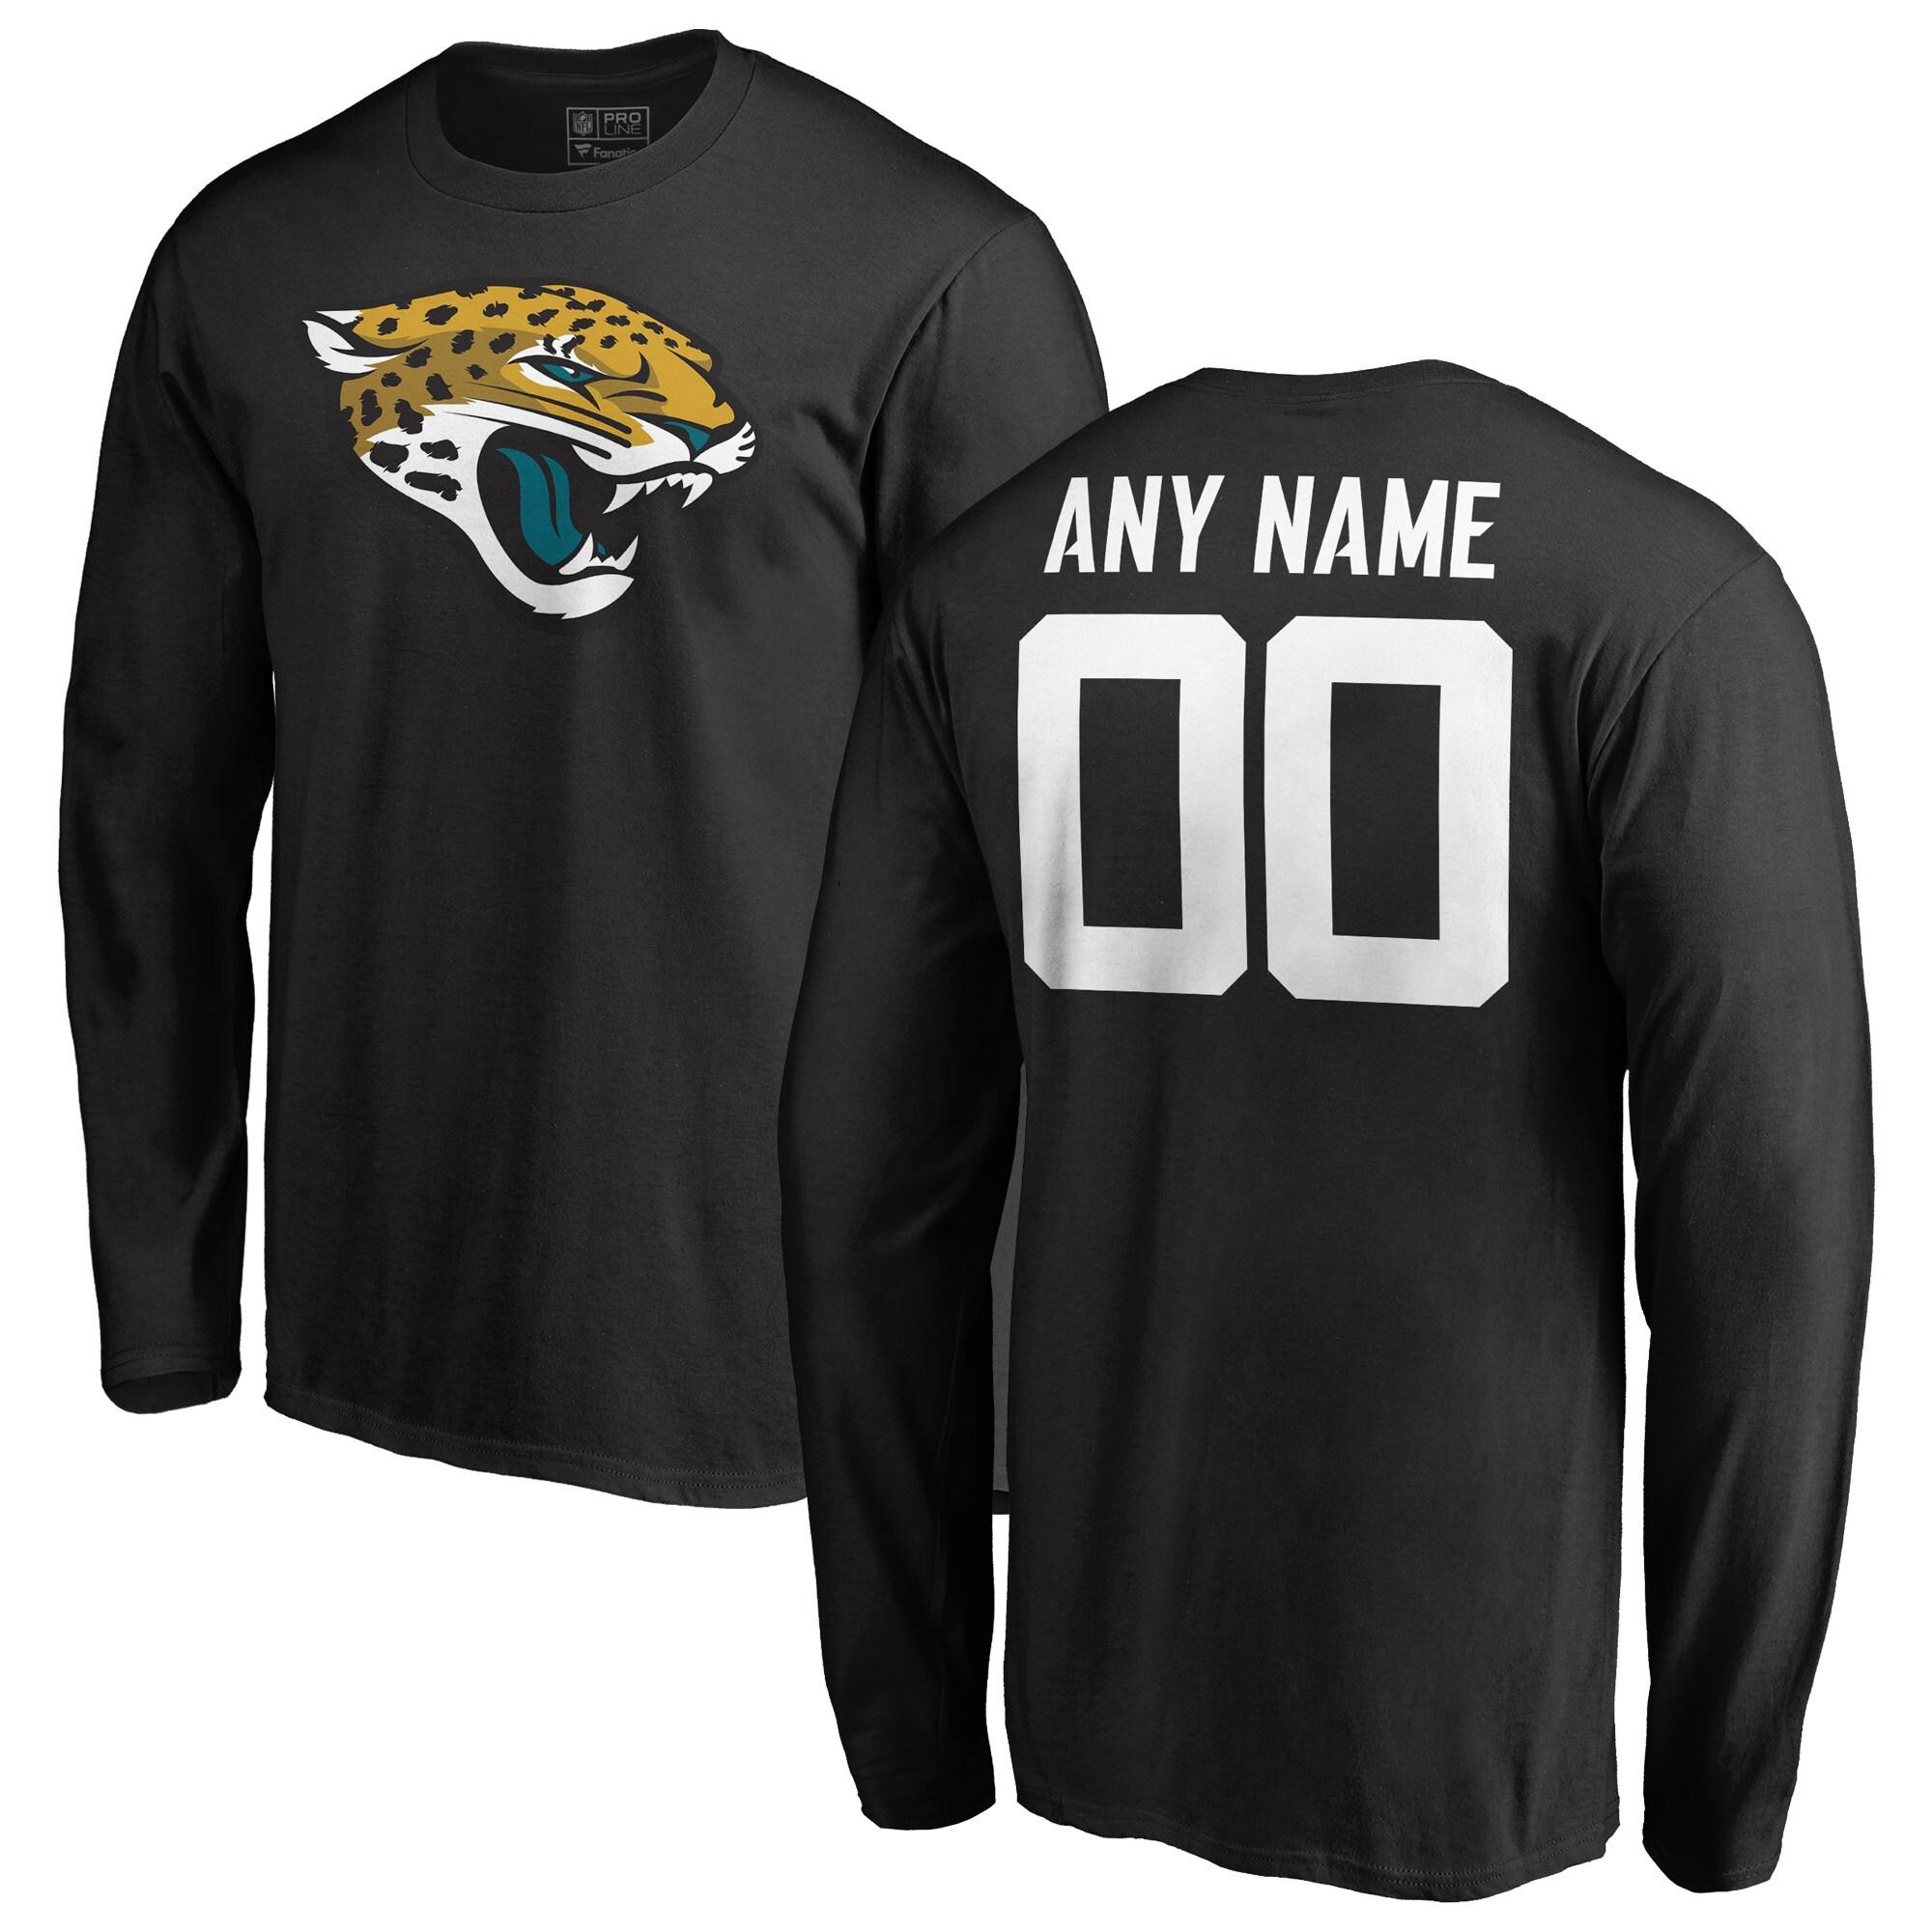 Jacksonville Jaguars NFL Pro Line Any Name & Number Logo Personalized Long Sleeve T-Shirt - Black